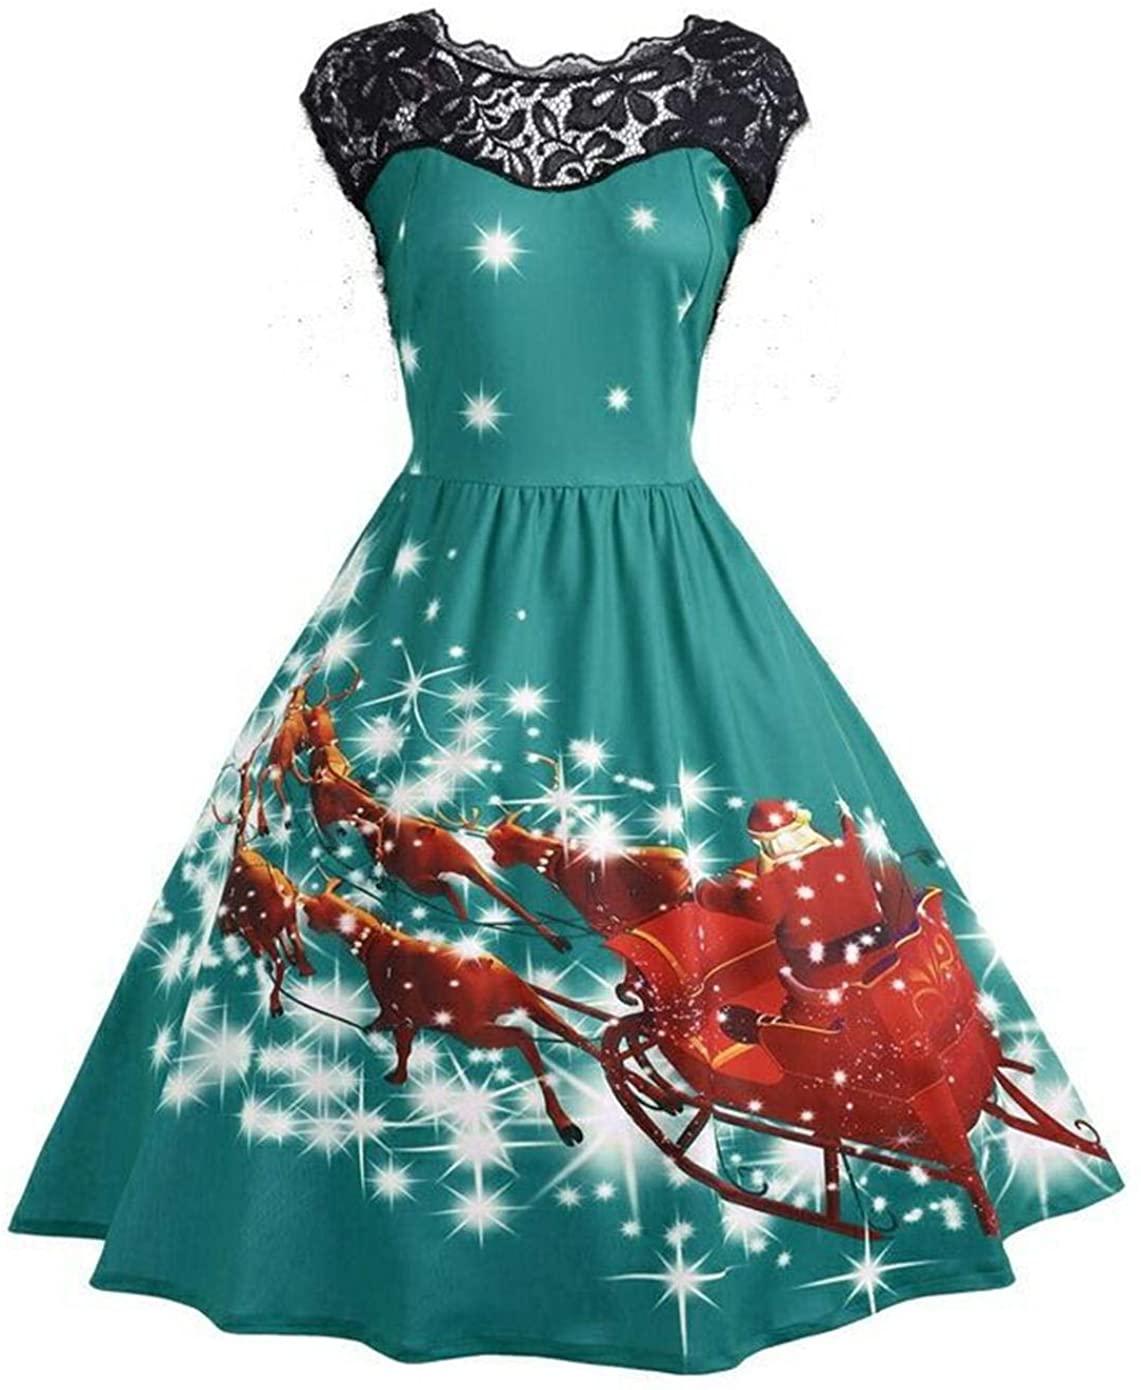 Women?s Vintage Sleeveless Bat Cat Pumpkin Print Dress Halloween Party Dress Christmas Party Swing Dresses